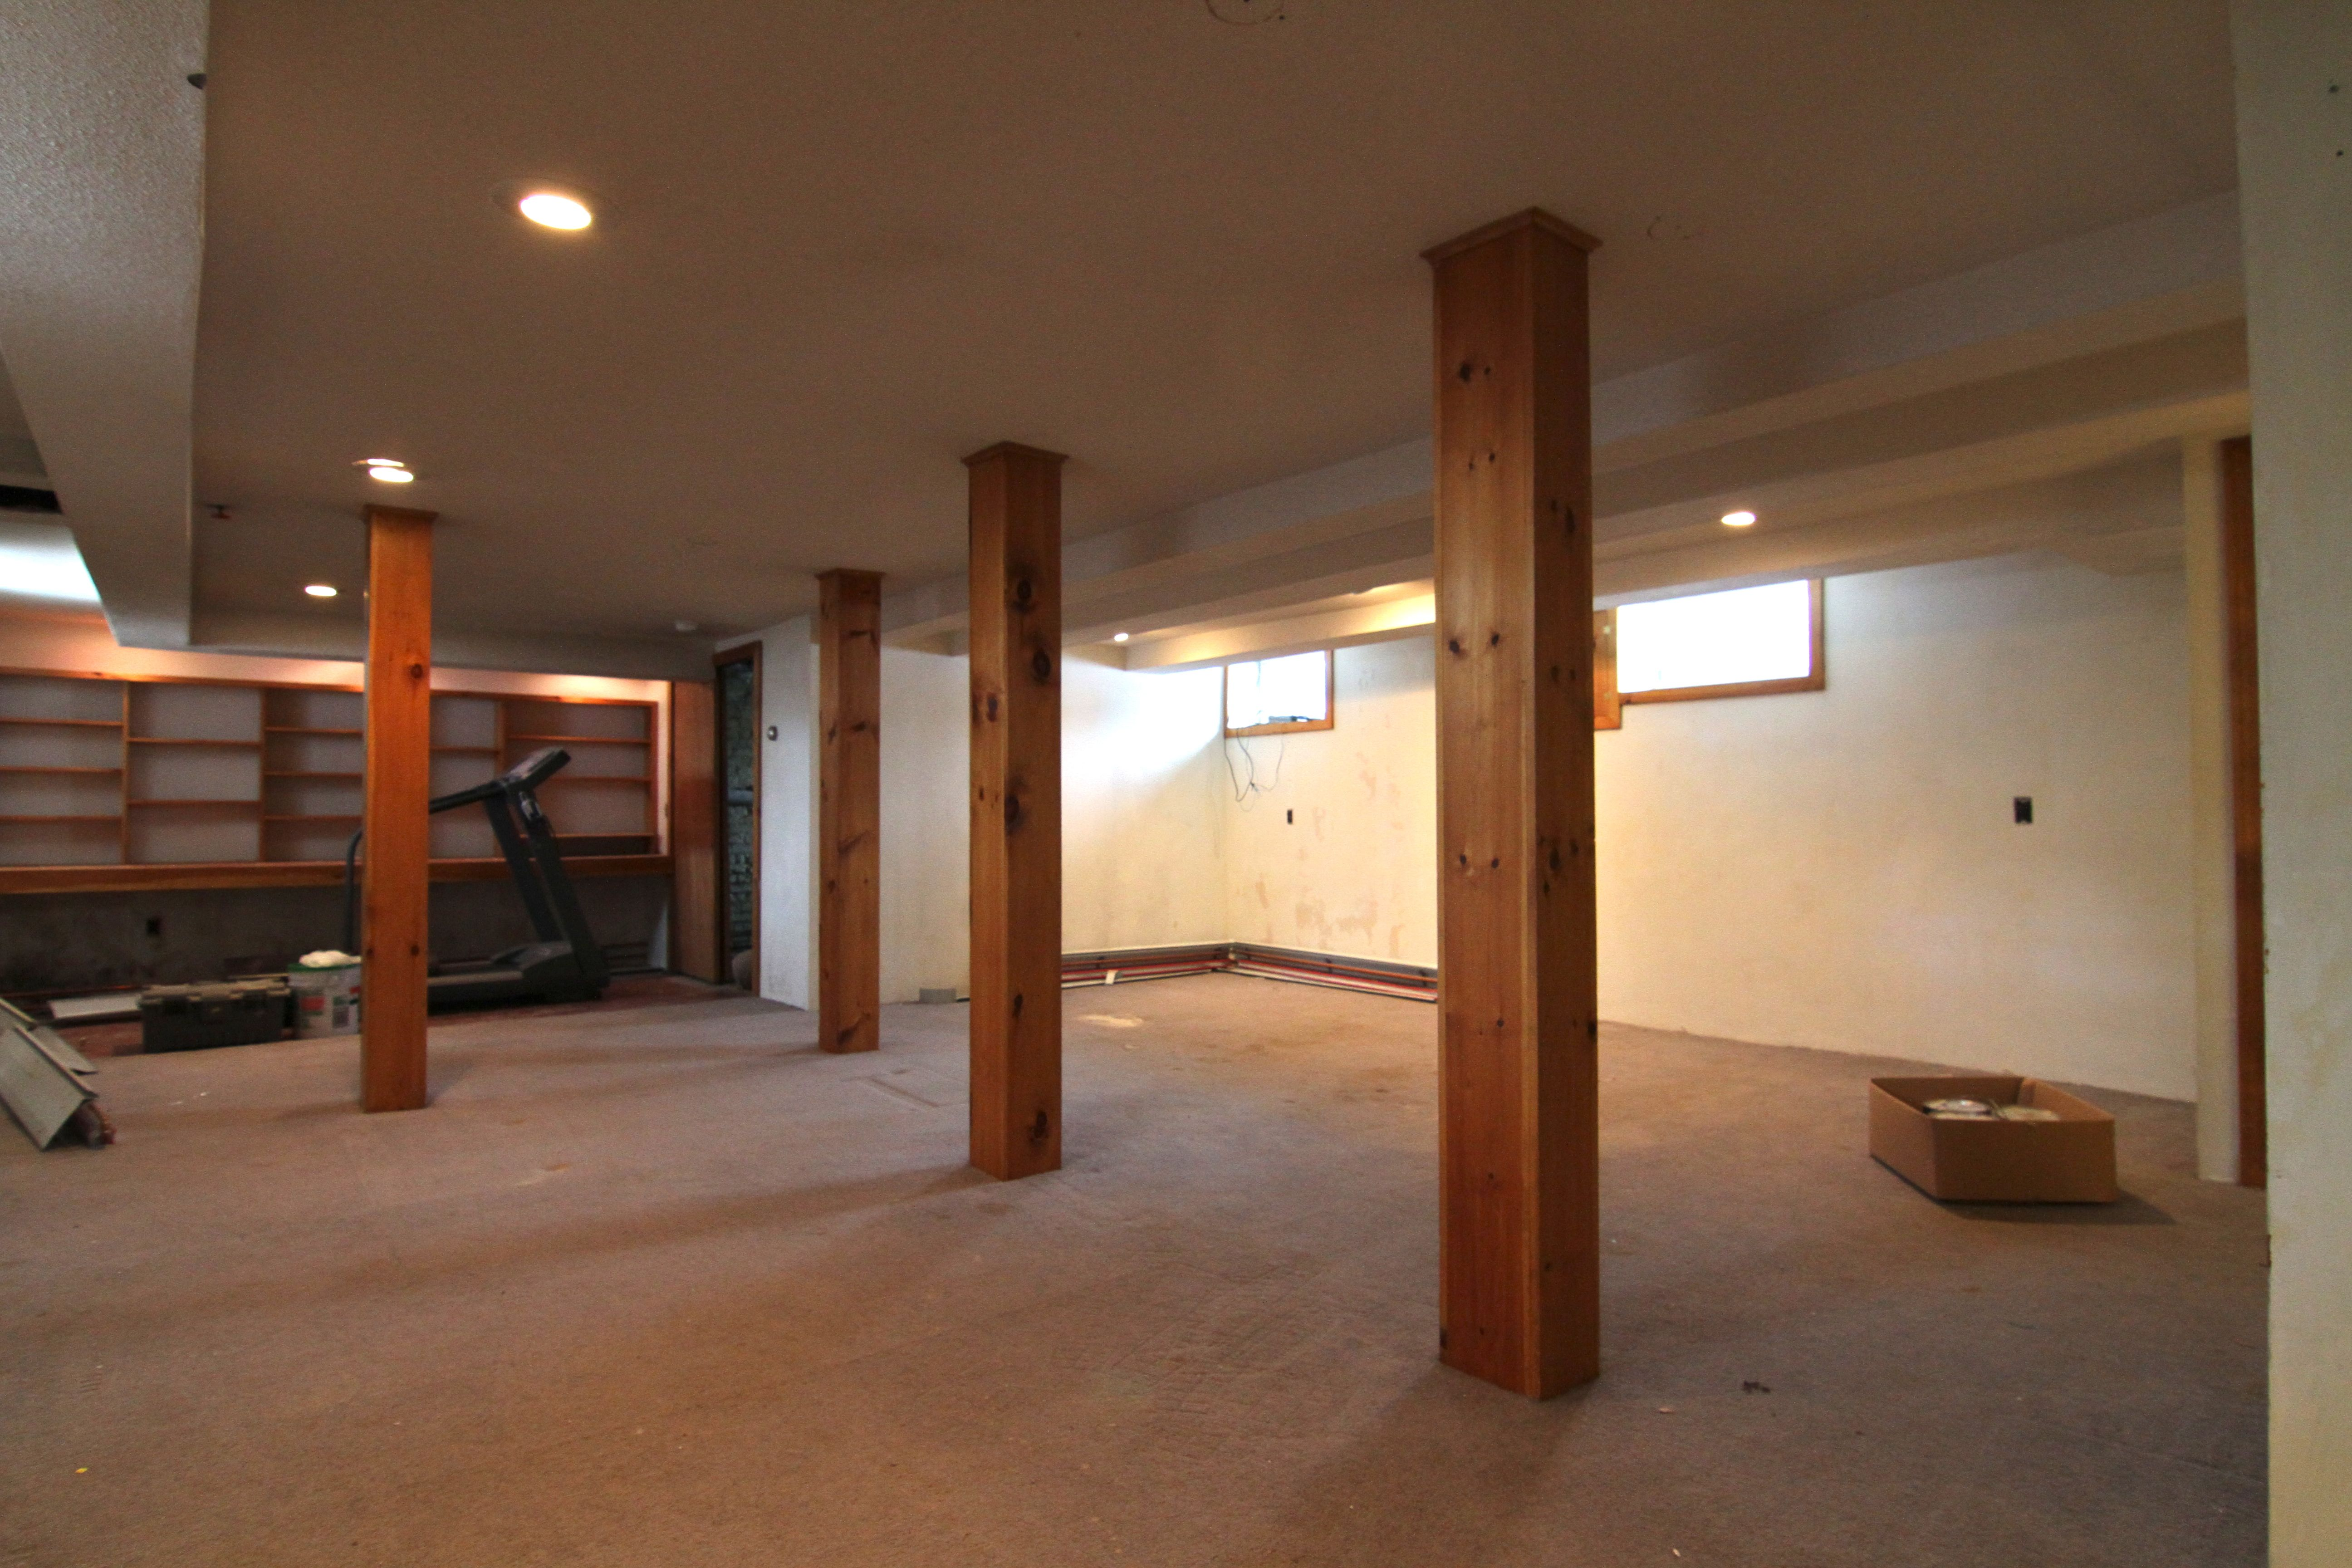 Basement BEFORE: knotty pine, shabby (not chic) carpet, dingy paint, peeling wallpaper.